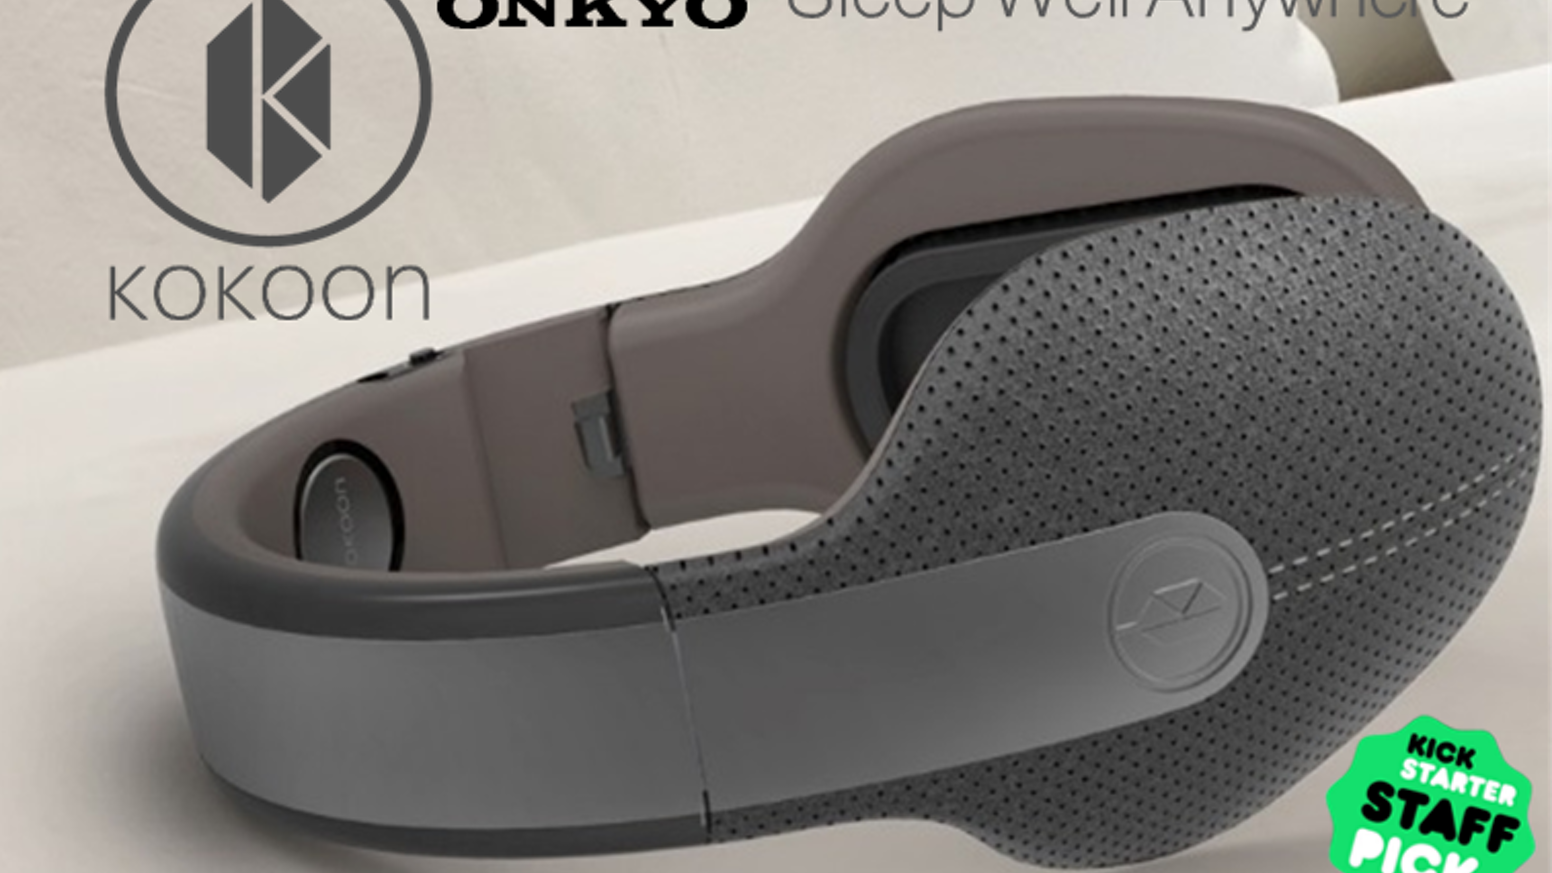 Sleep better with the world s first sleep sensing EEG headphones. Perfect  peace and comfort with 020de91eb